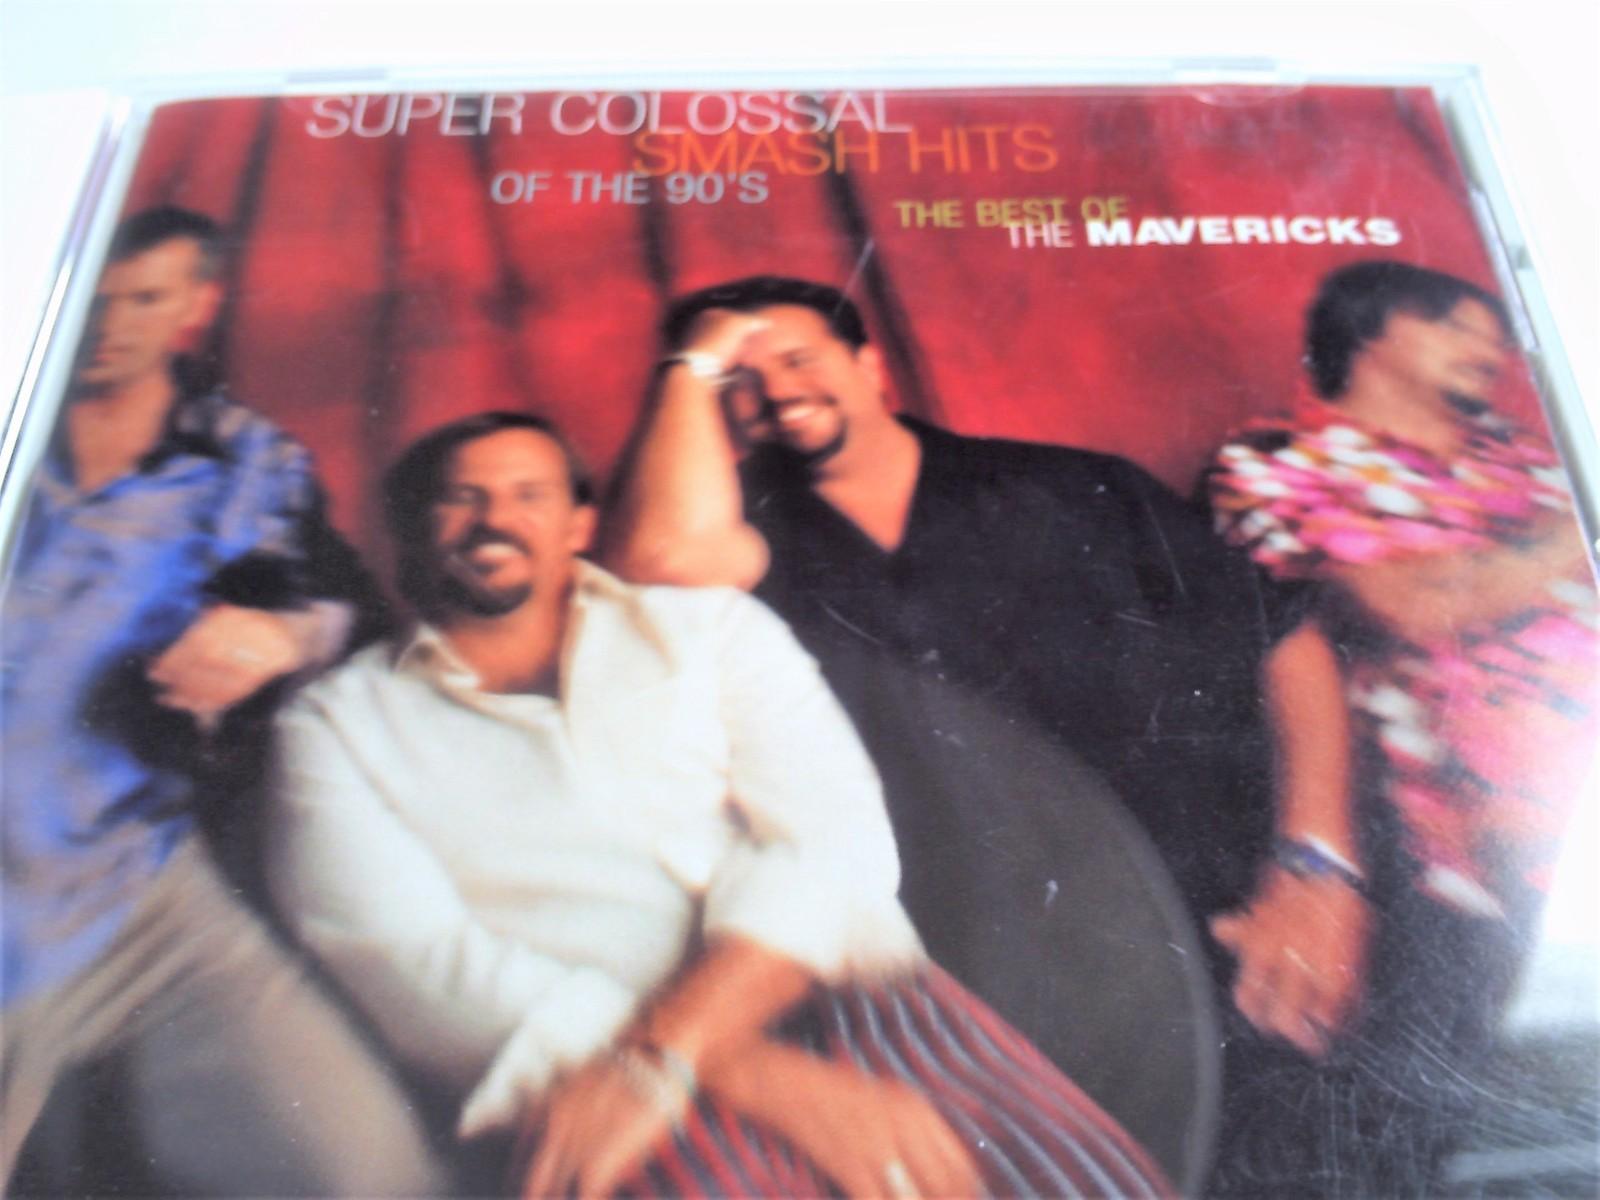 The Mavericks Super Colossal Smash Hits of the 90's CD